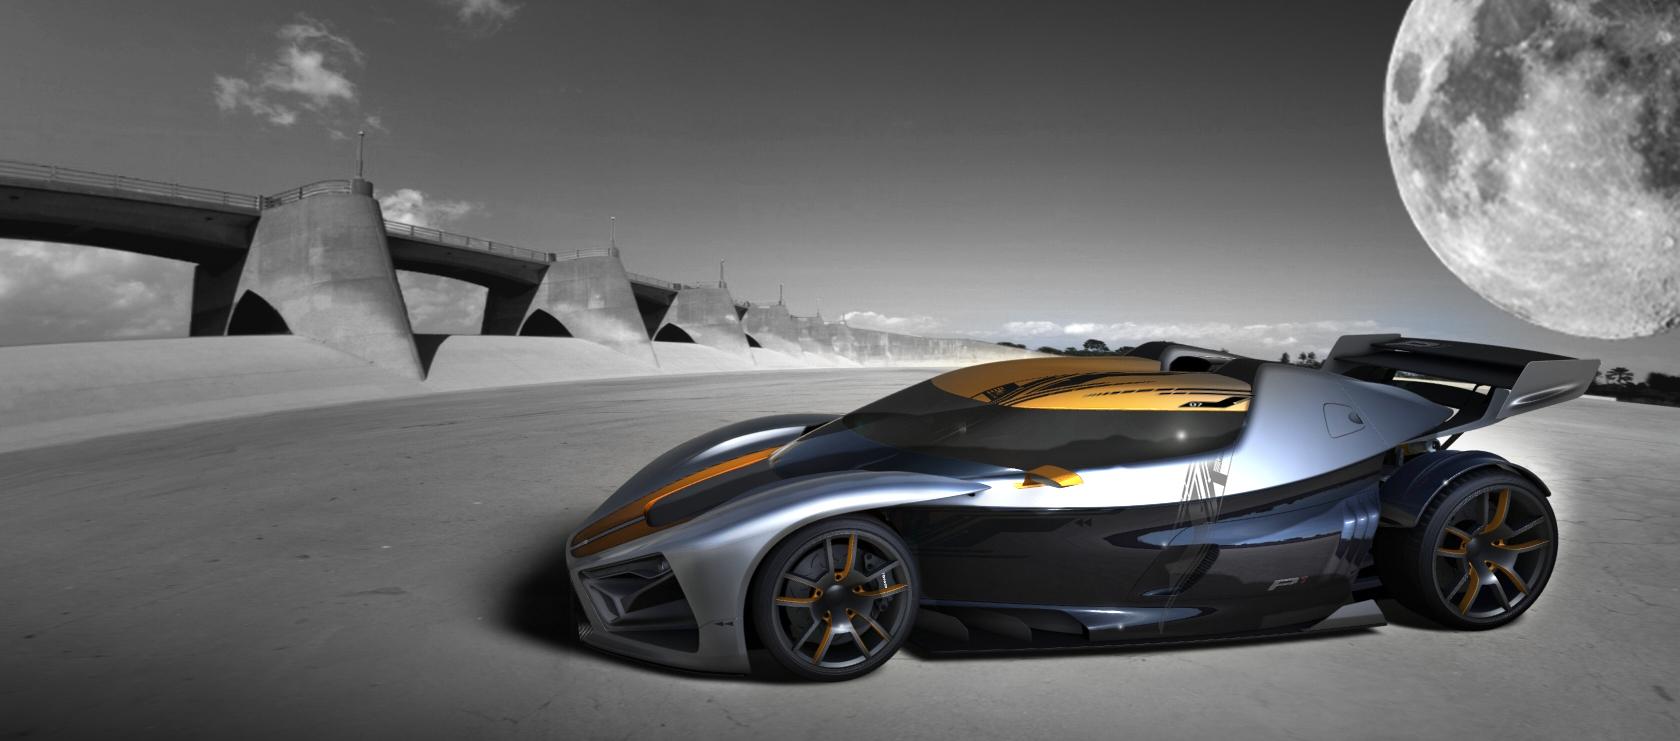 All Types ktm x-bow specs : Donto P1 | Sports Cars | Diseno-Art